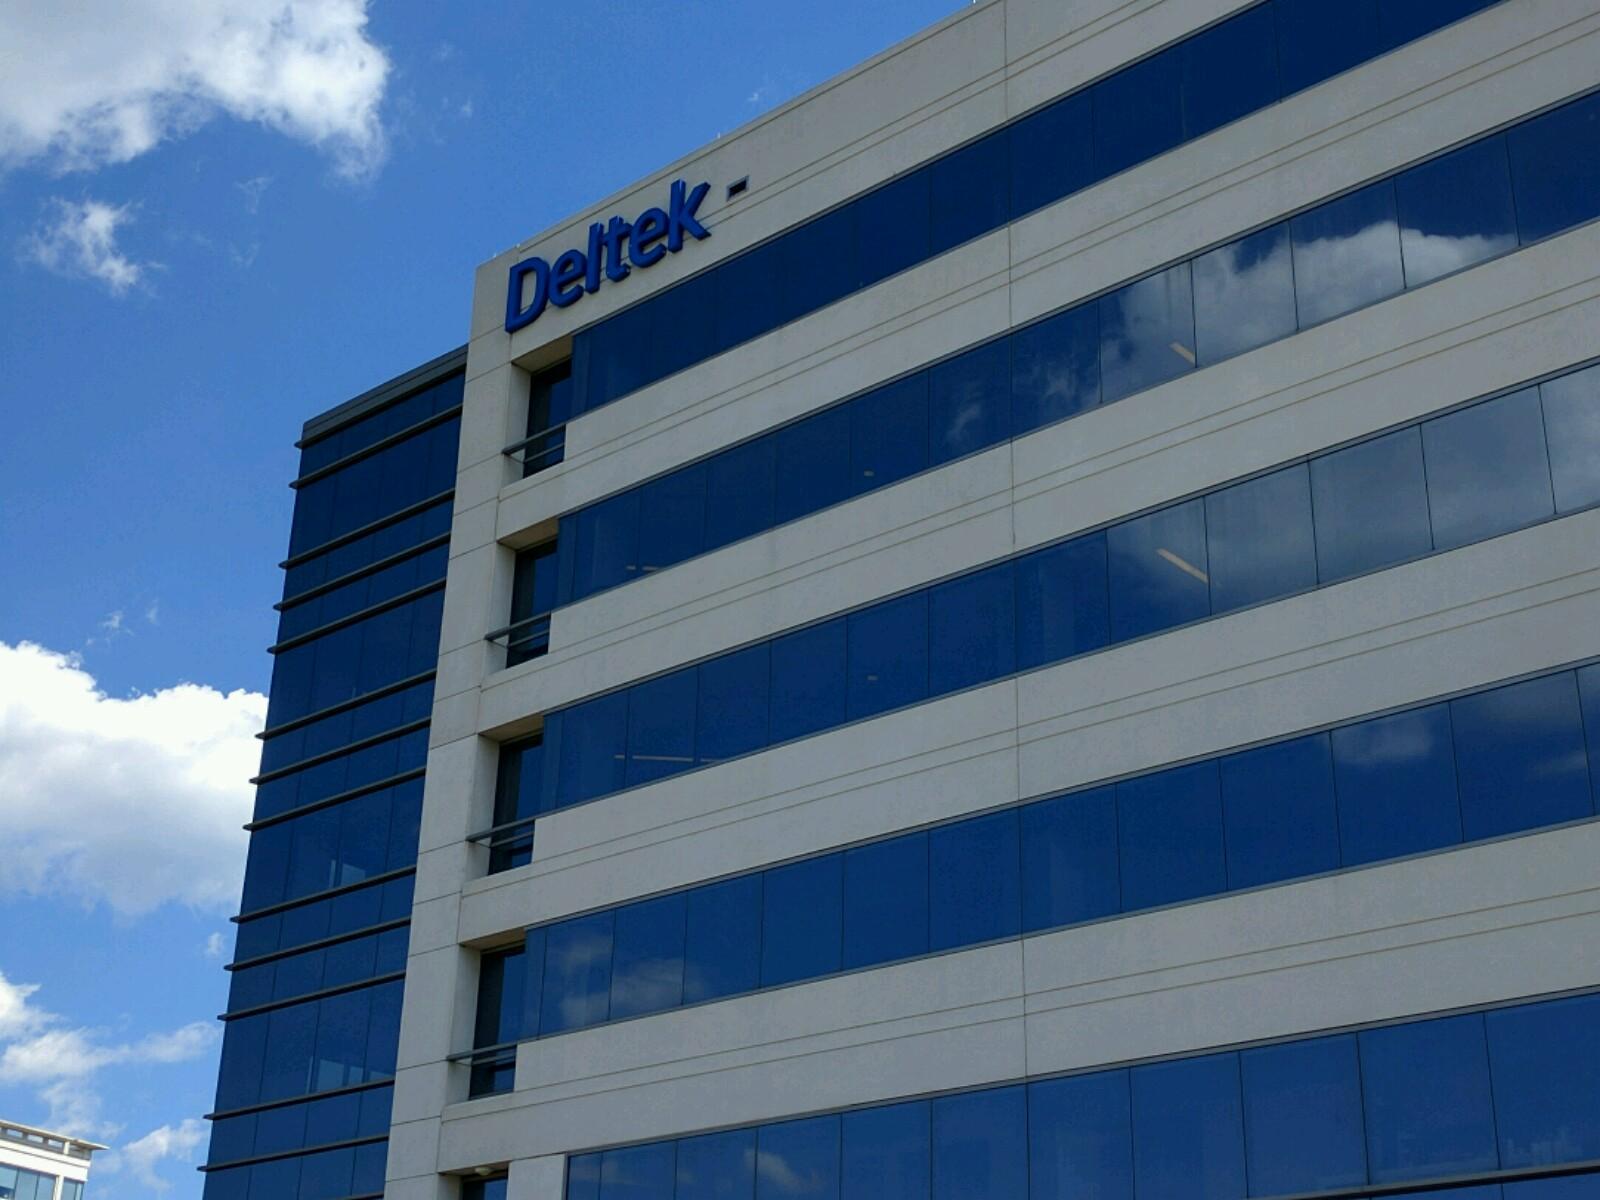 Deltek's corporate headquarters in Herndon, Virginia.